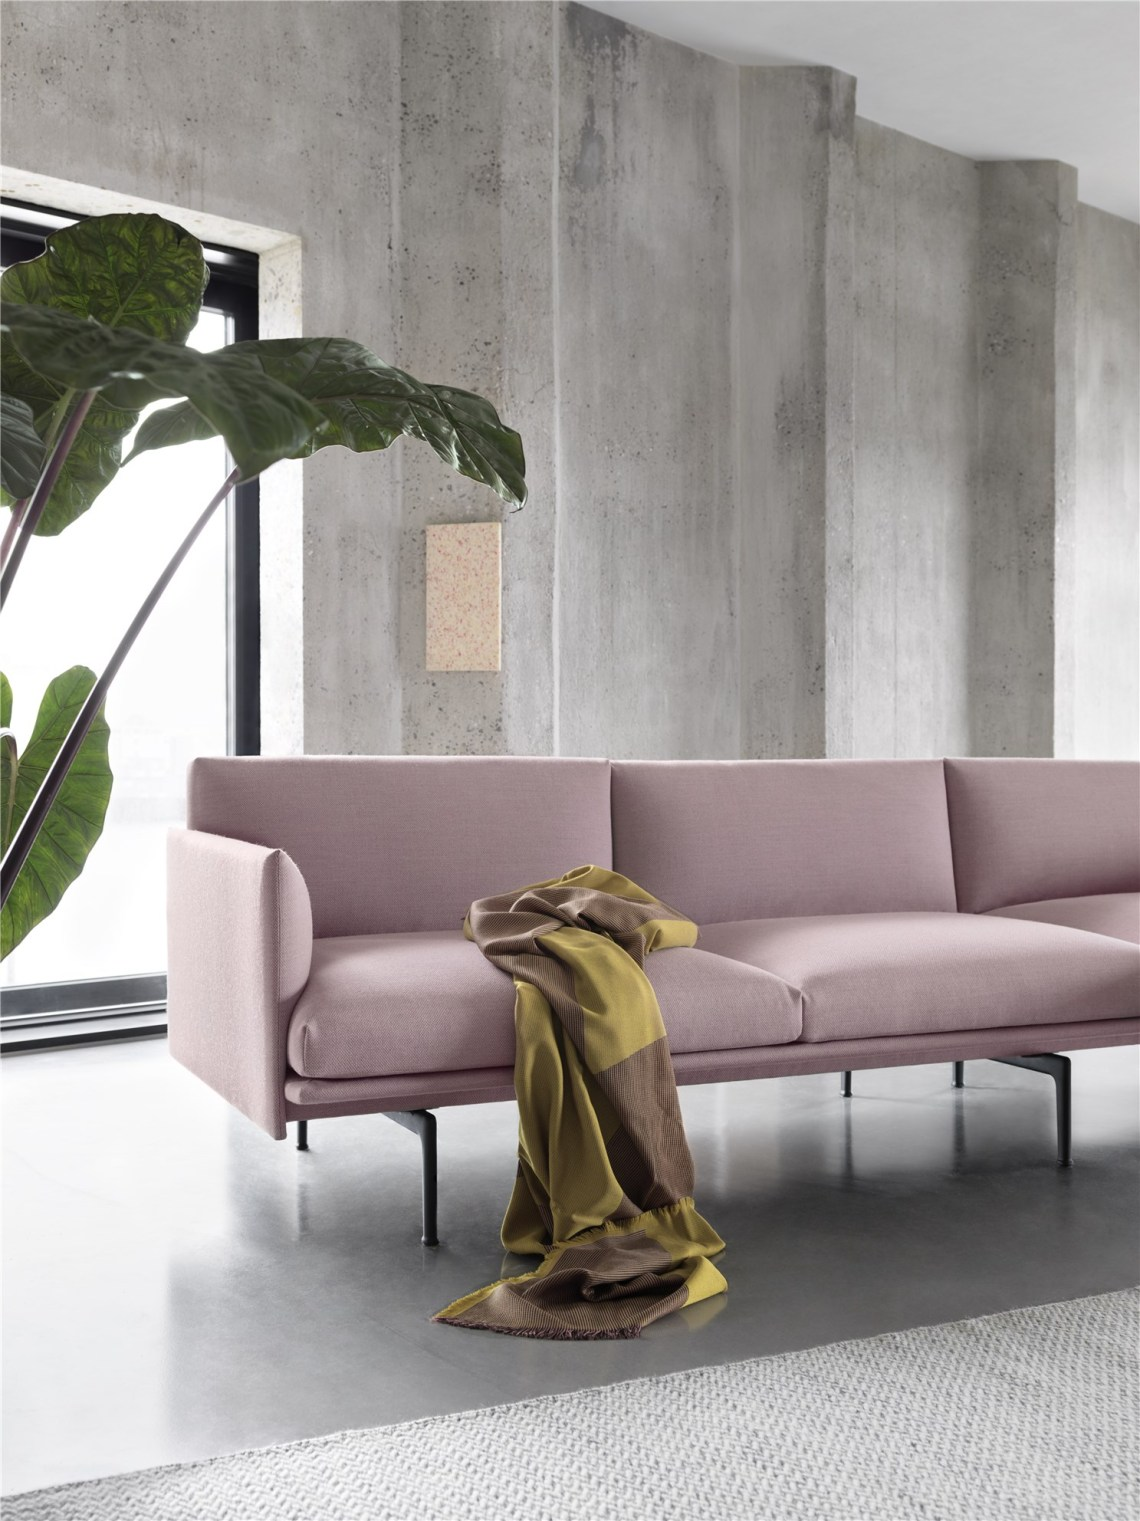 Muuto Spring Summer 2018 - via Coco Lapine Design blog